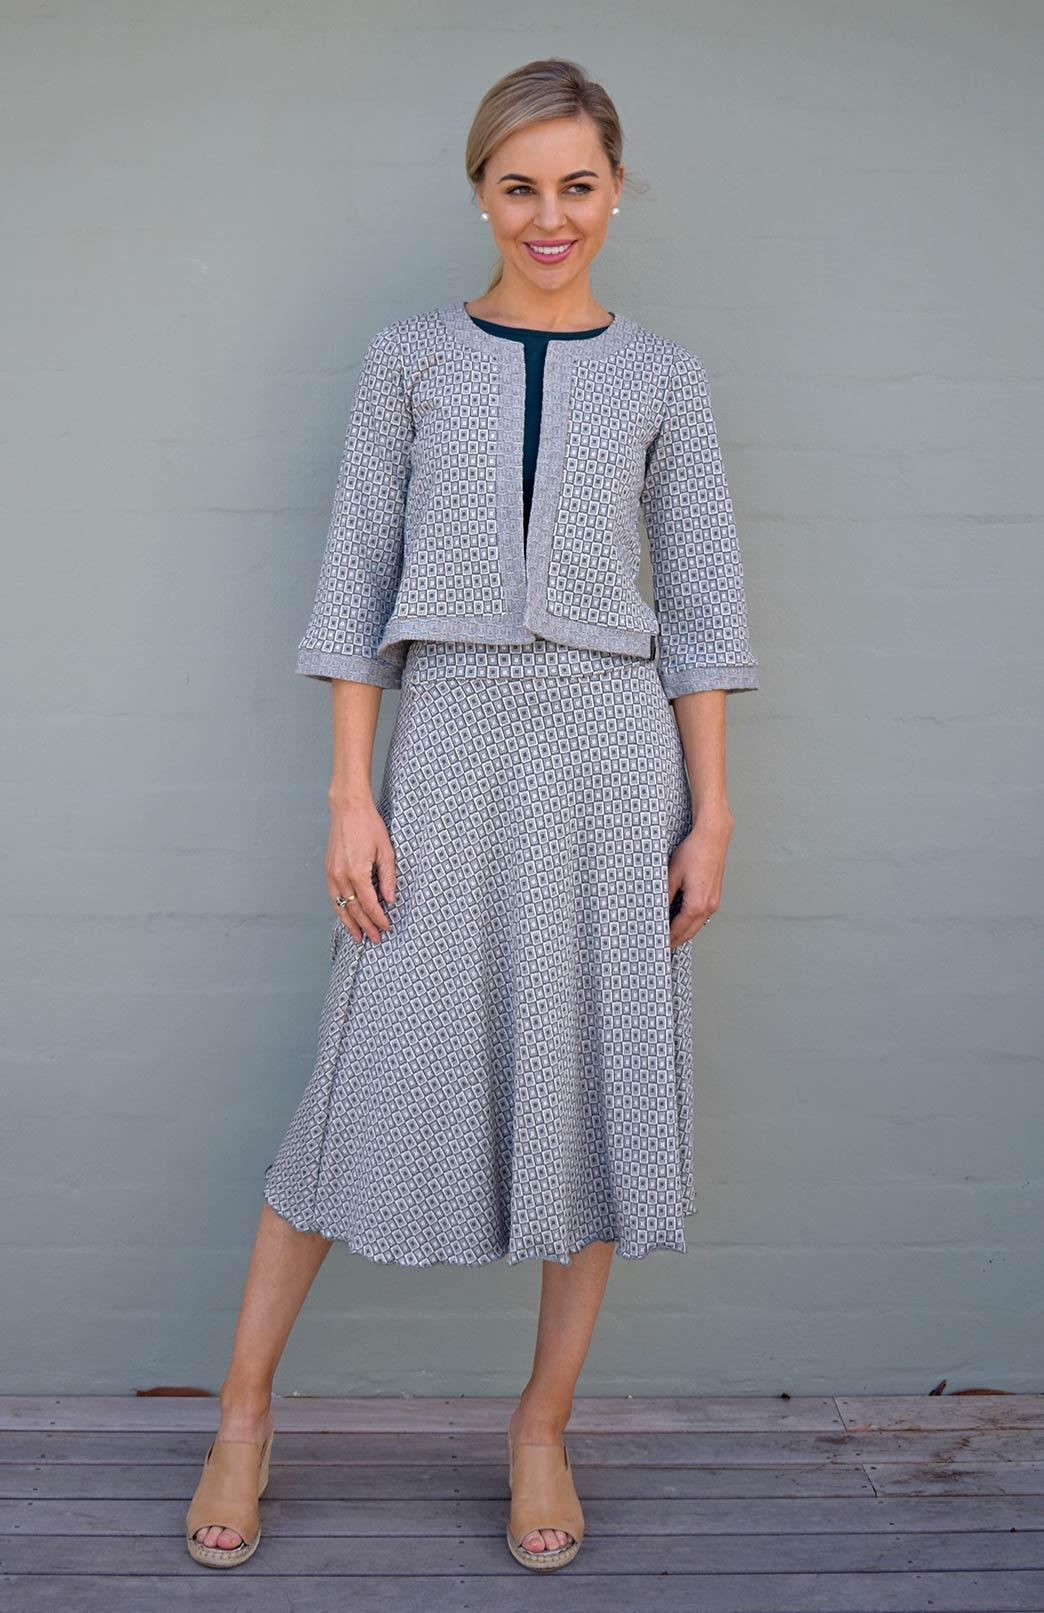 Twirl Skirt - Women's Olive Green and Ivory Mini Check A-Line Swing Wool Skirt - Smitten Merino Tasmania Australia